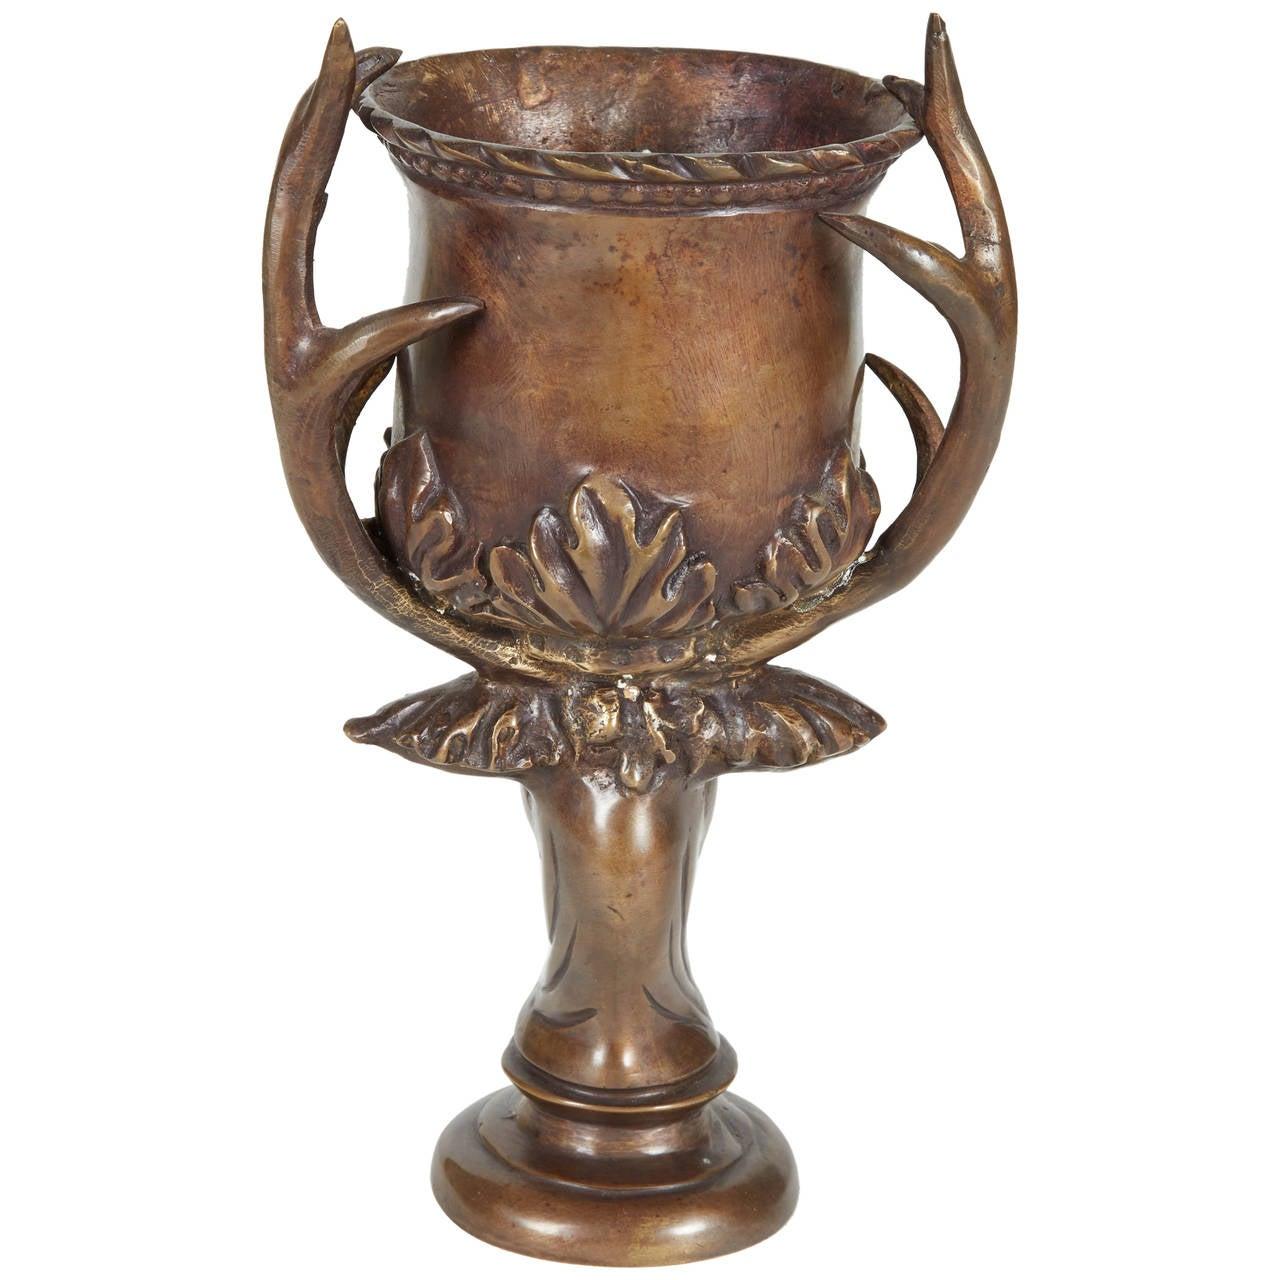 1890s Antique German Bronze Chalice At 1stdibs